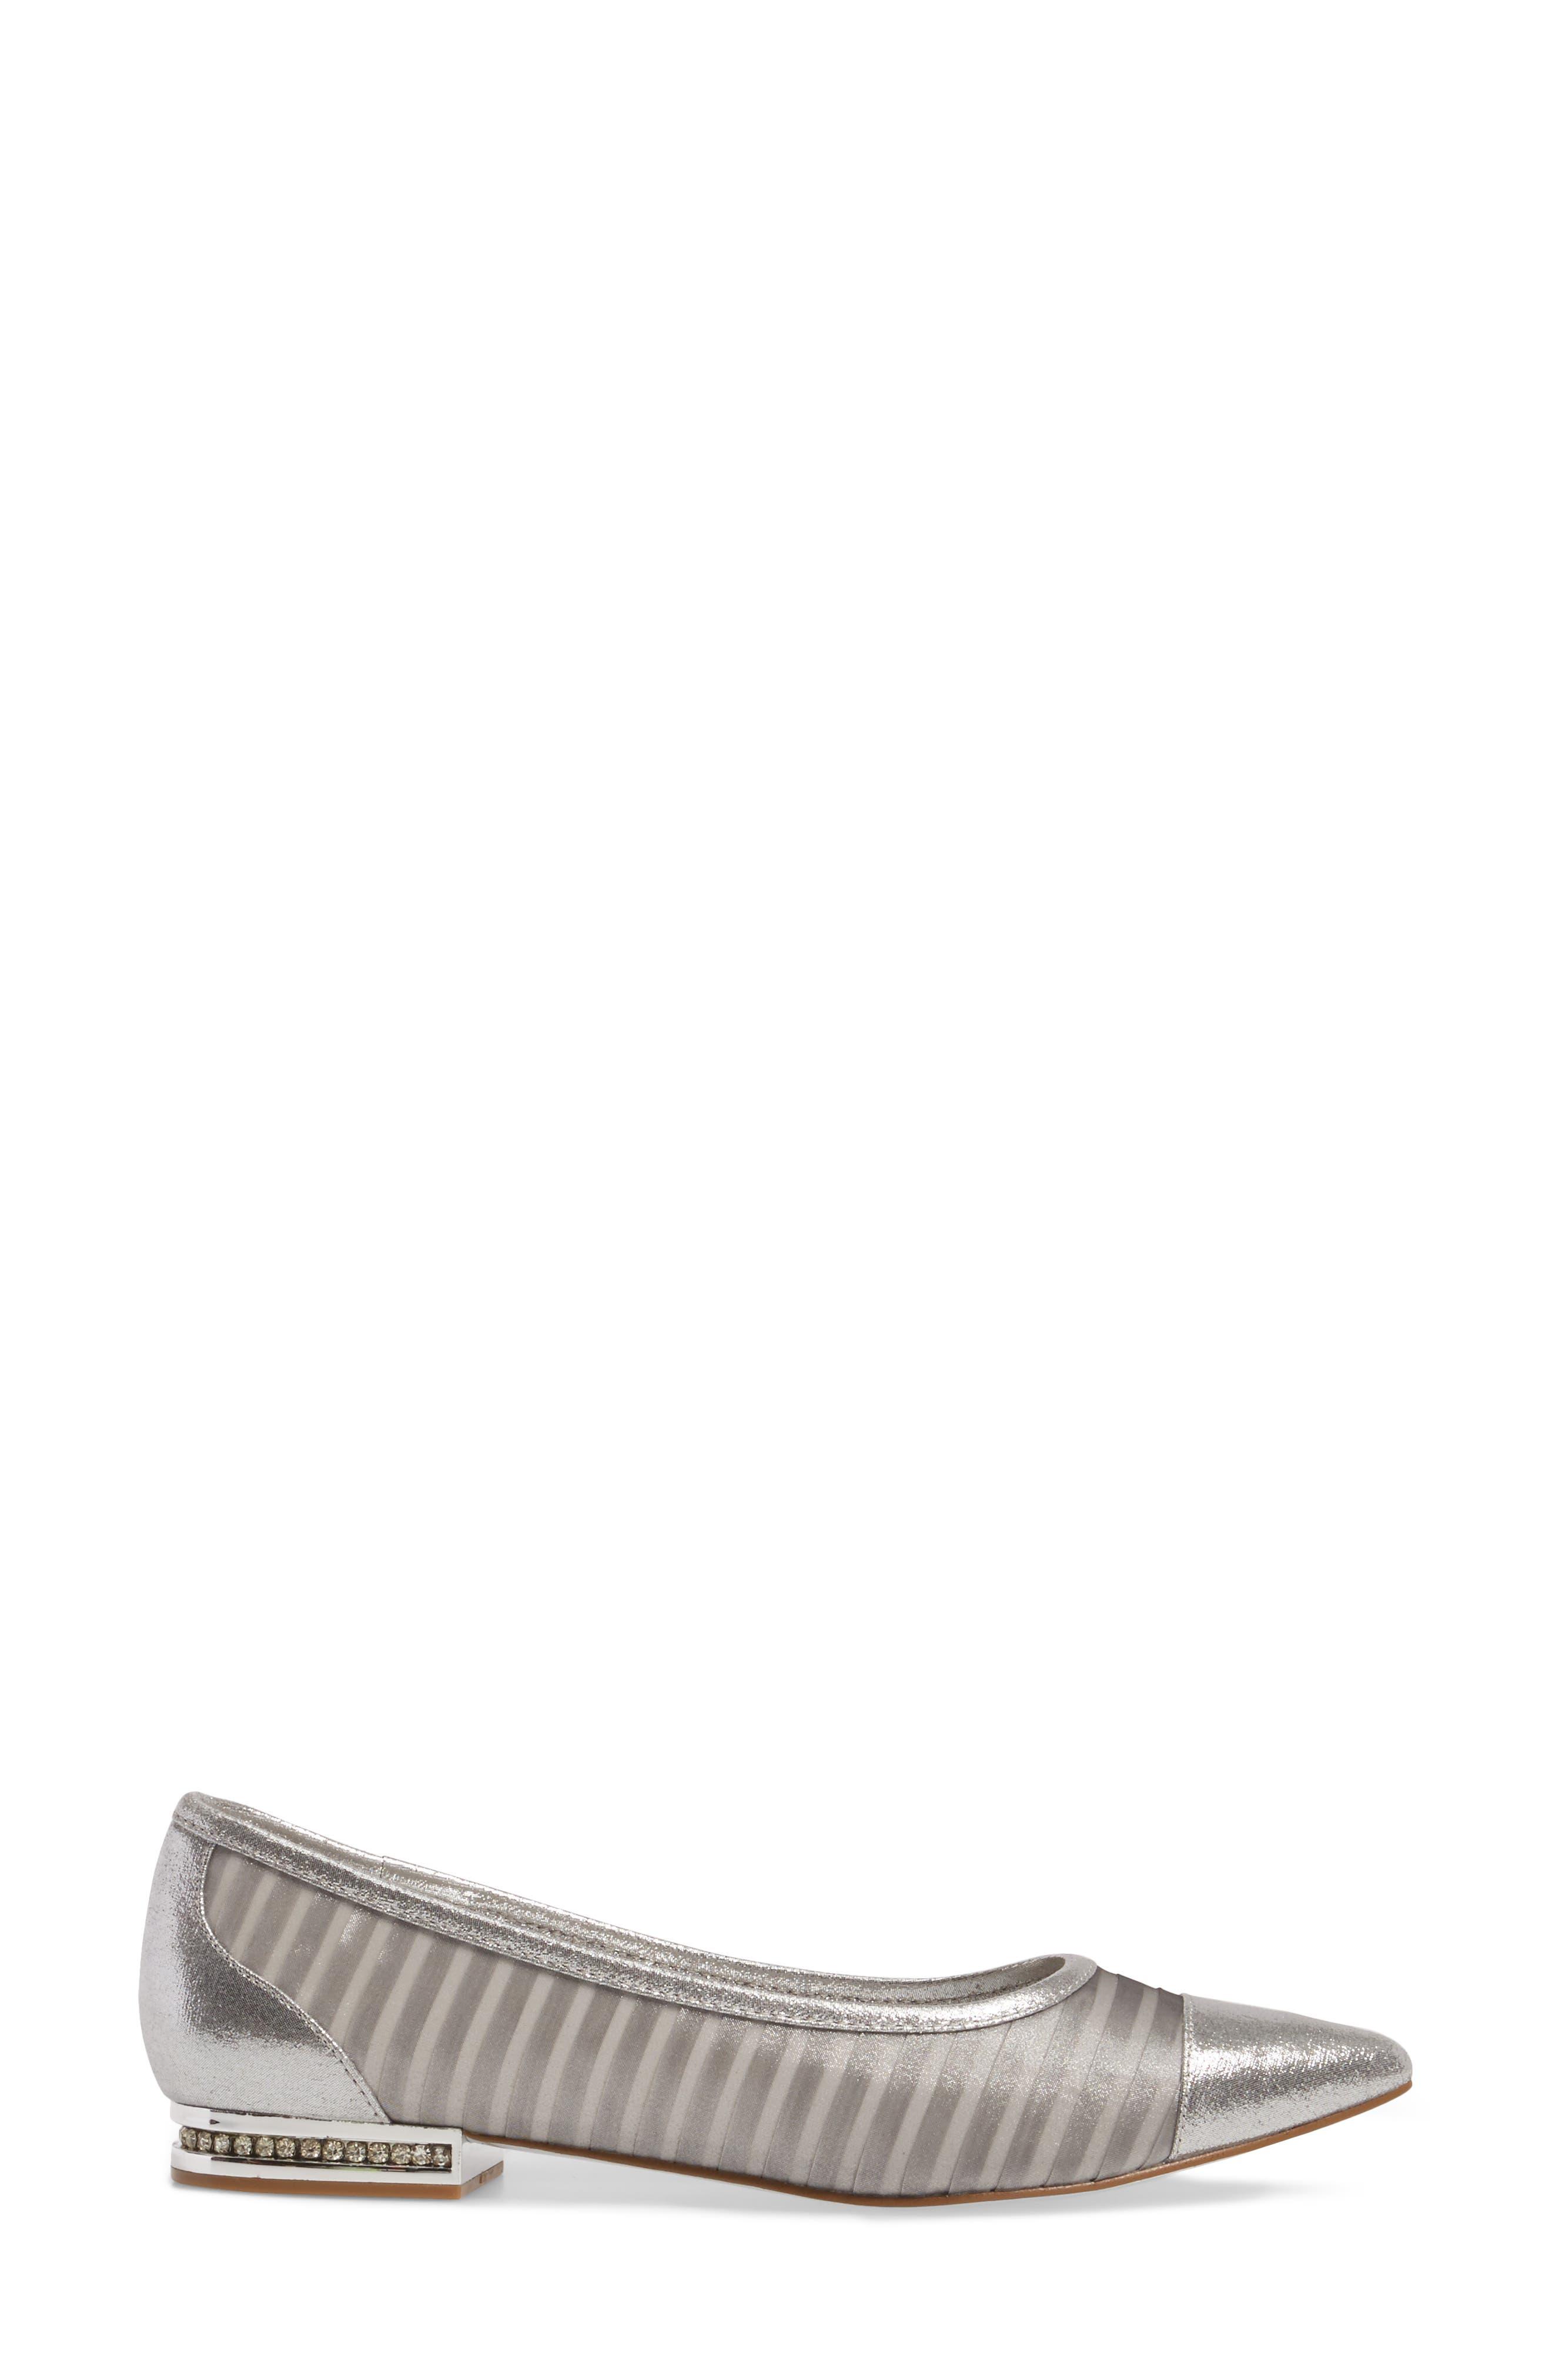 Tiffany Pointy Toe Flat,                             Alternate thumbnail 3, color,                             Silver Fabric